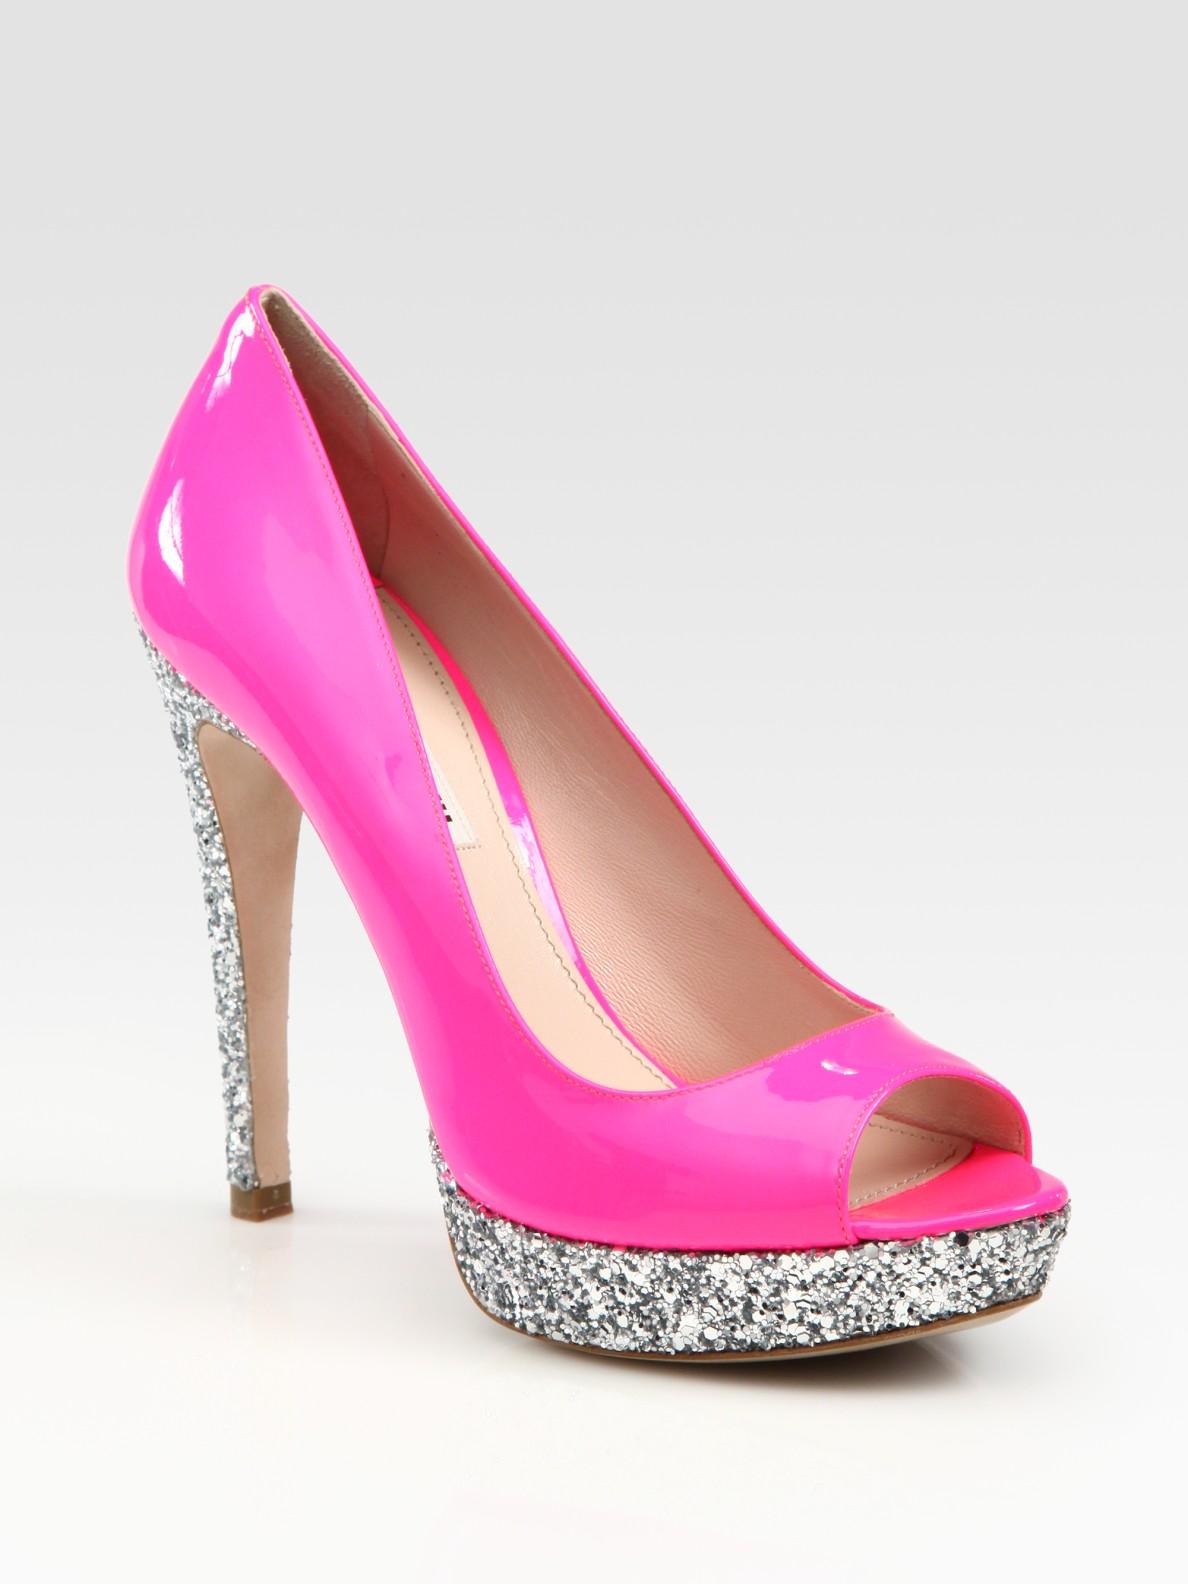 66ca977cc10 Lyst - Miu Miu Glitter Patent Leather Peep Toe Platform Pumps in Pink